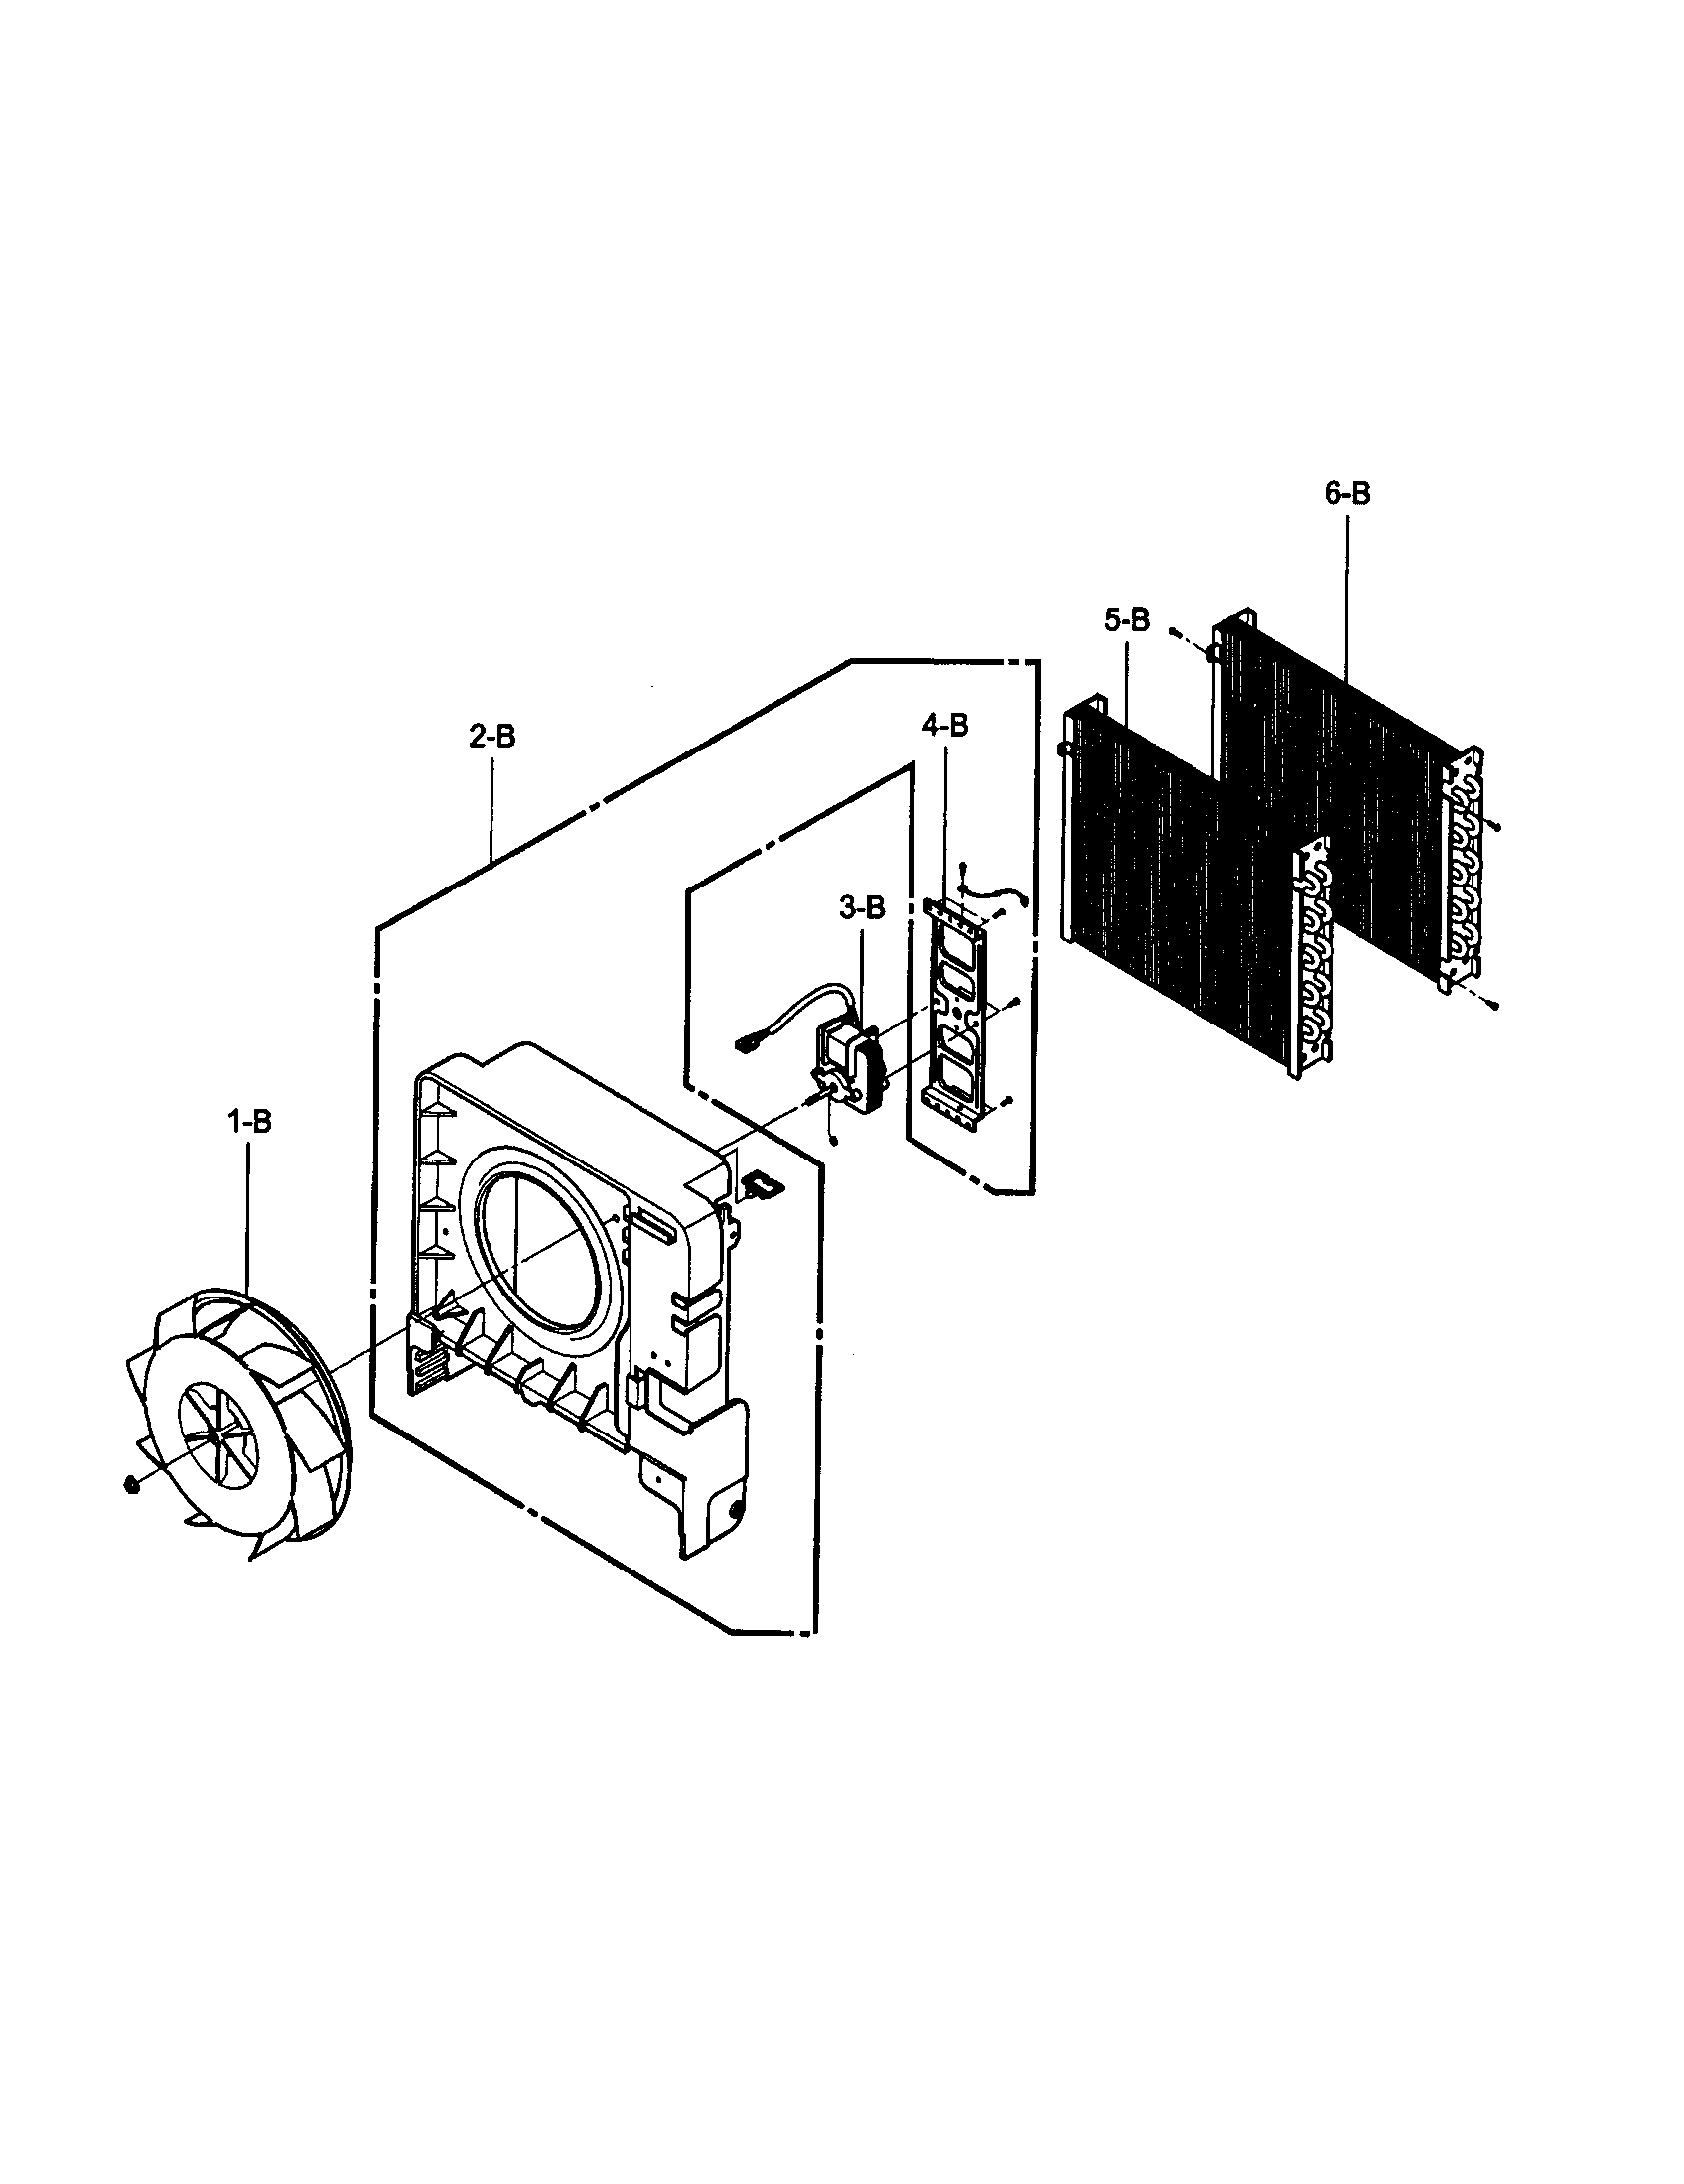 FAN Diagram & Parts List for Model 58052450200 Kenmore